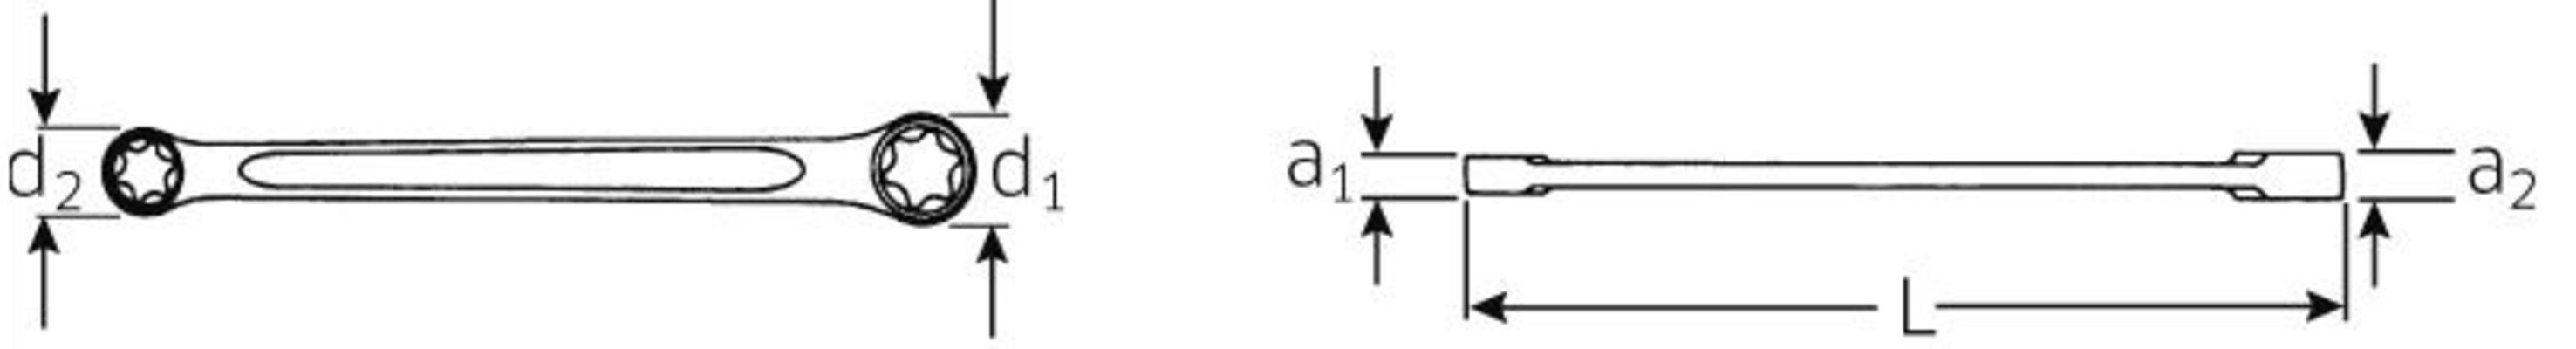 Torx-silmukka-avain, Stahlwille - Silmukka-avain E6 x E8, pituus 115,5 mm